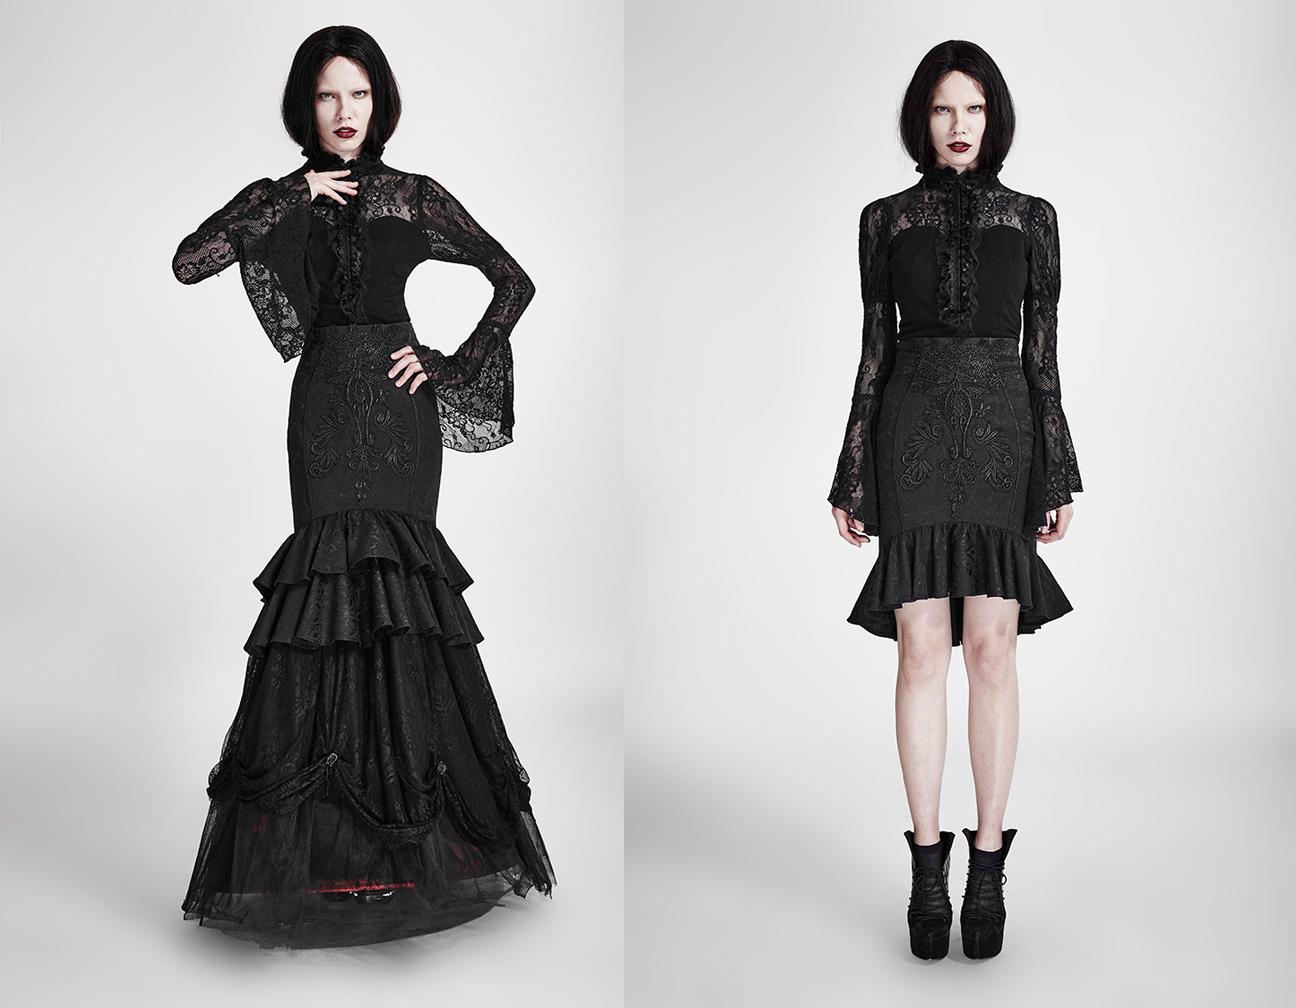 1463341607 Black Widow Mermaid Double Skirt – Dress Like a Pirate